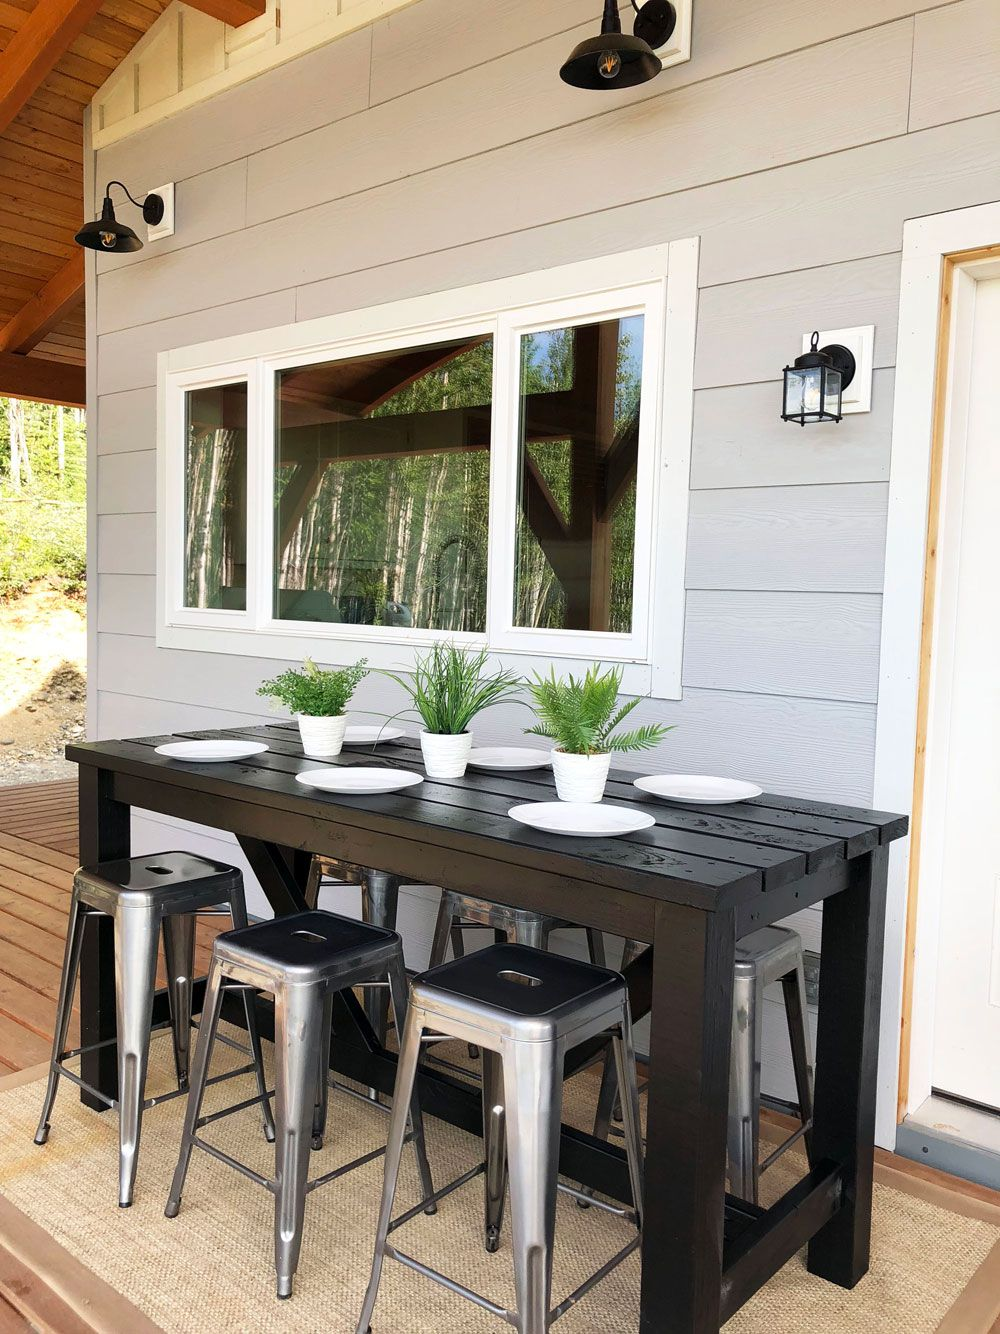 Outdoor Bar Table Diy, Outdoor Bar Top Dining Table